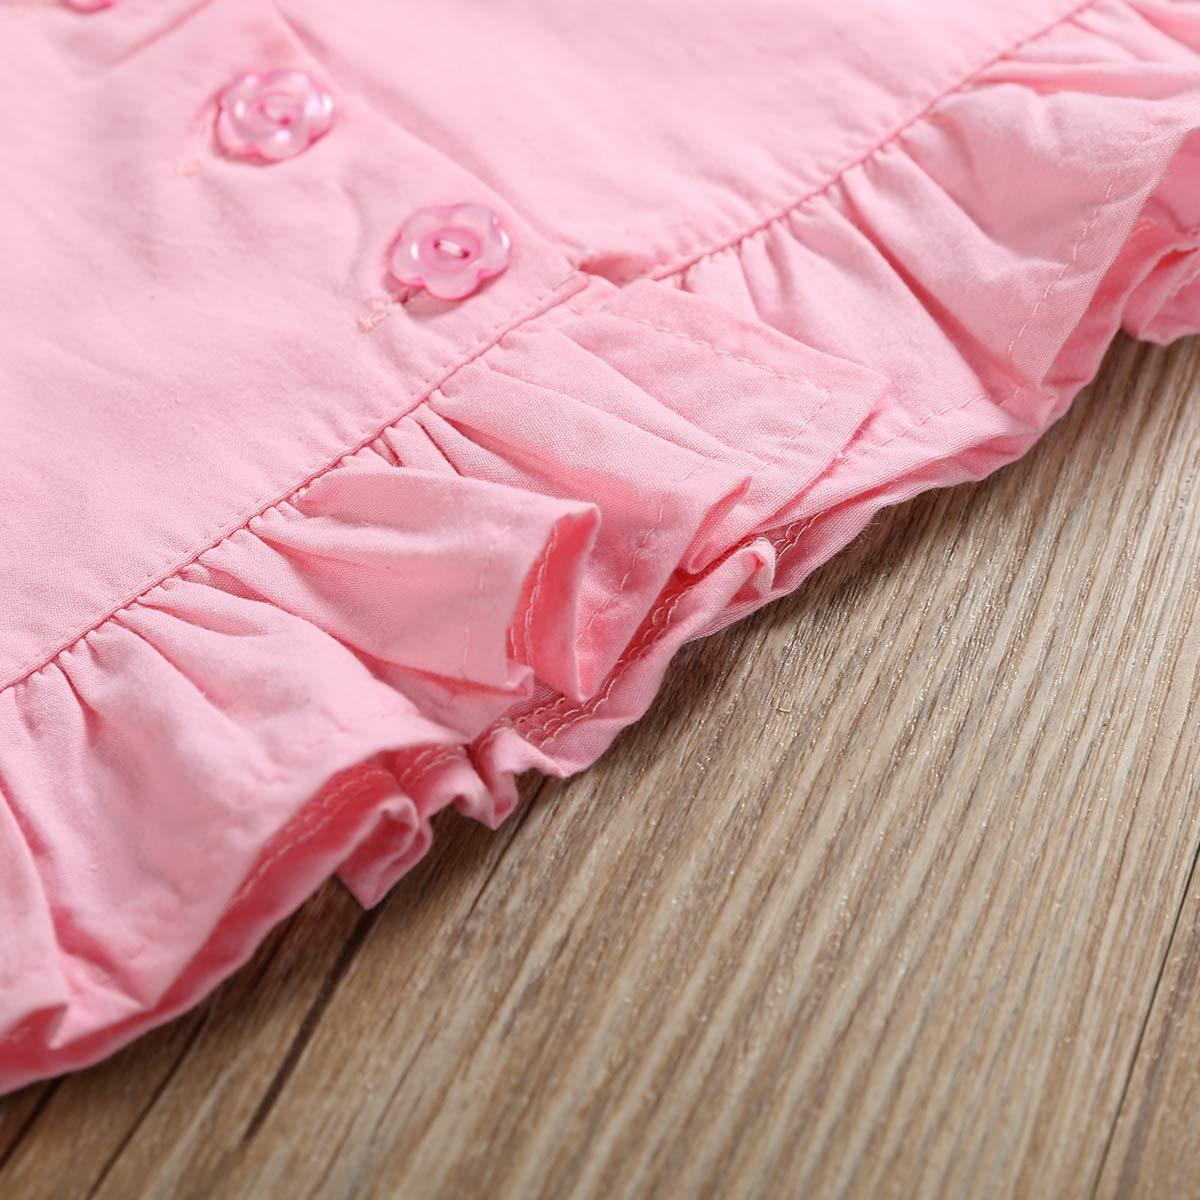 2PCS Infant Toddler Baby Girls Summer Set Ruffle Halter Vest Top Floral Bow Shorts 3 Botton Shirts Bamboo Pants Clothes